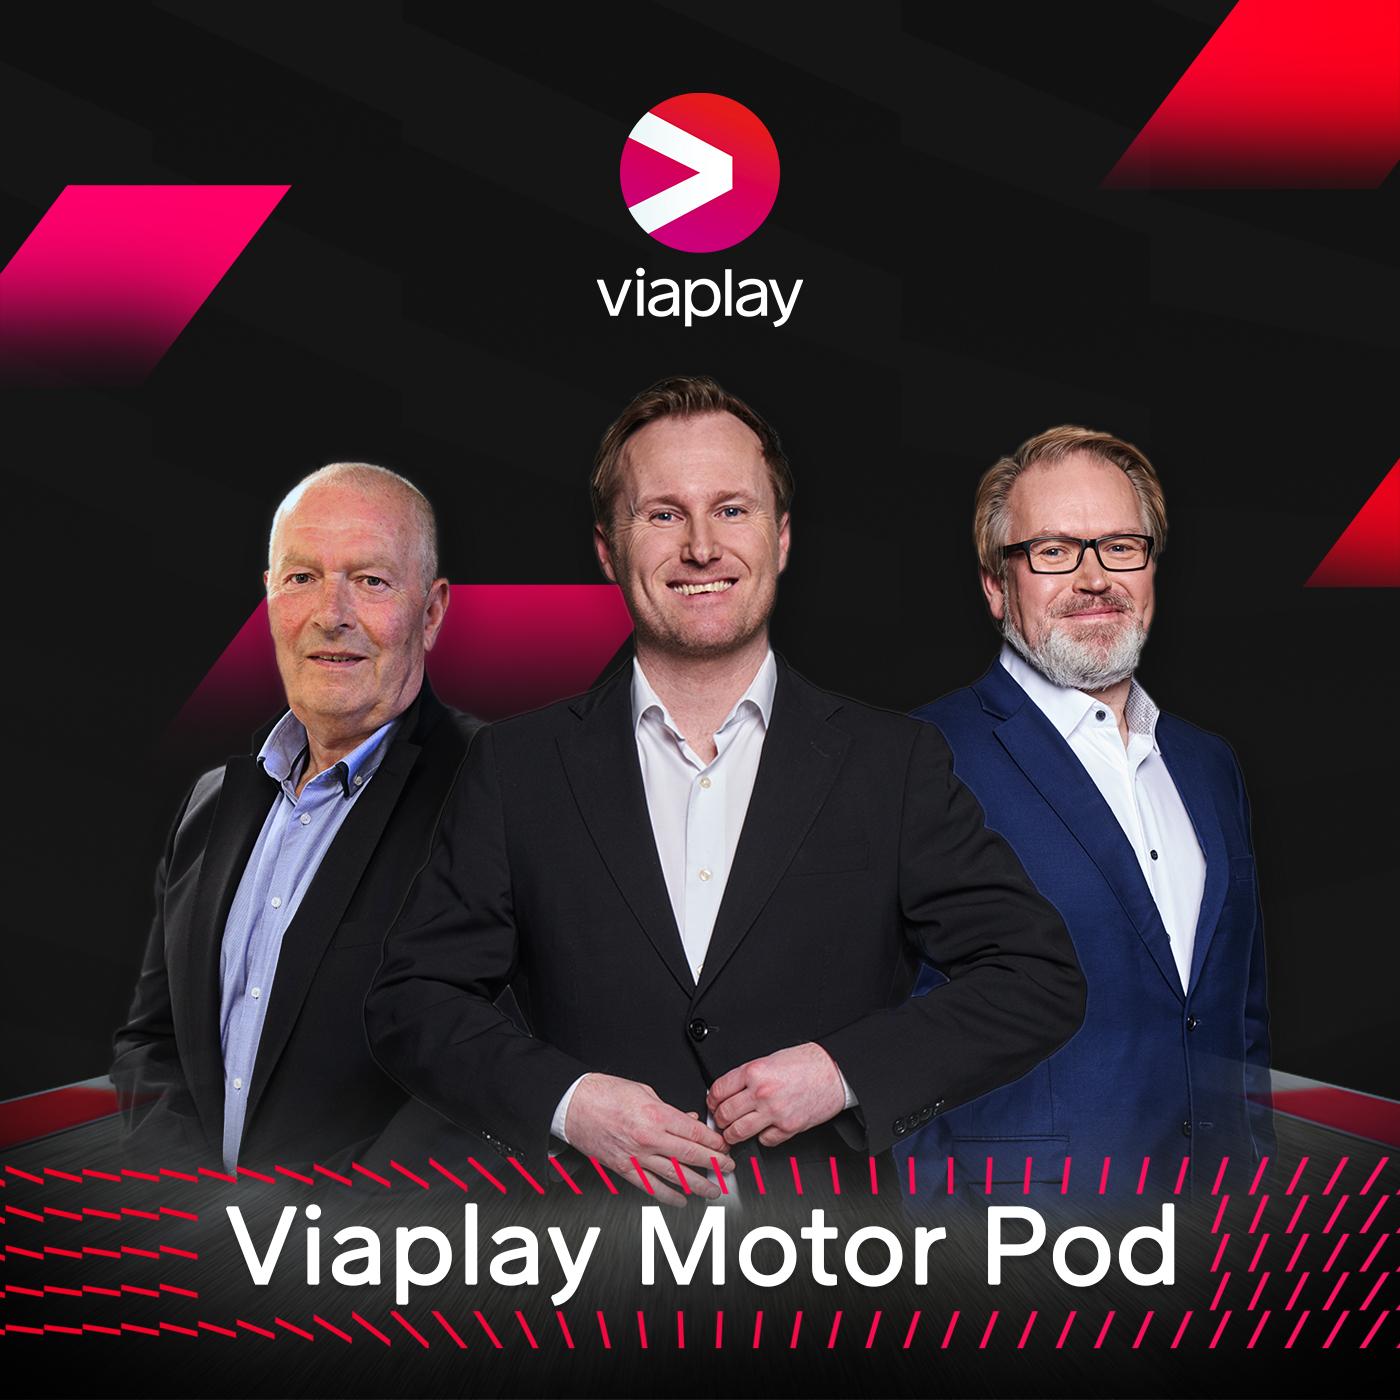 Viaplay Motor Pod